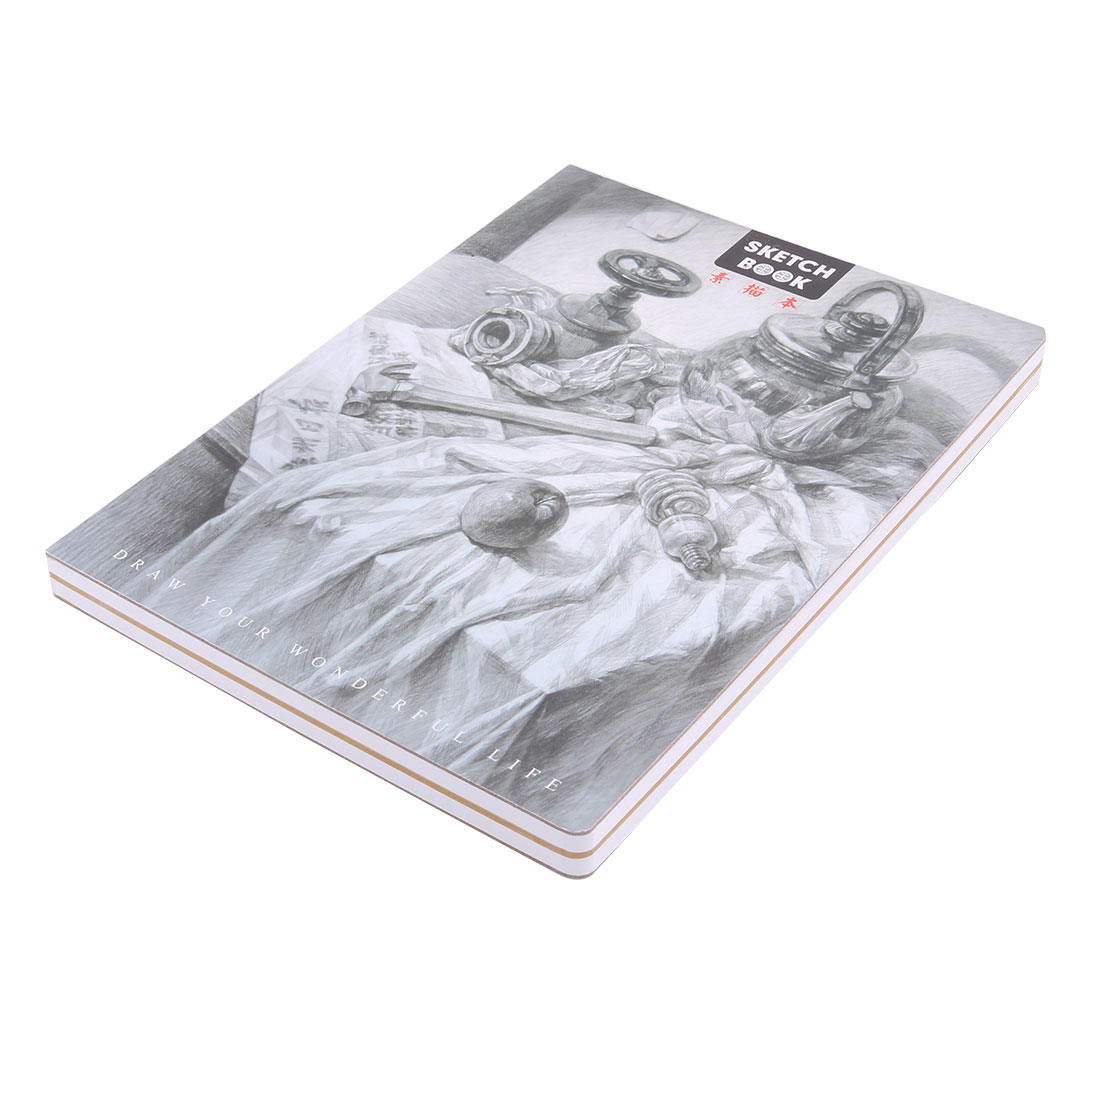 DELIJIA Authorized Gypsum Portrait Pattern Cover A4 Paper Sketch Book 112 Sheets